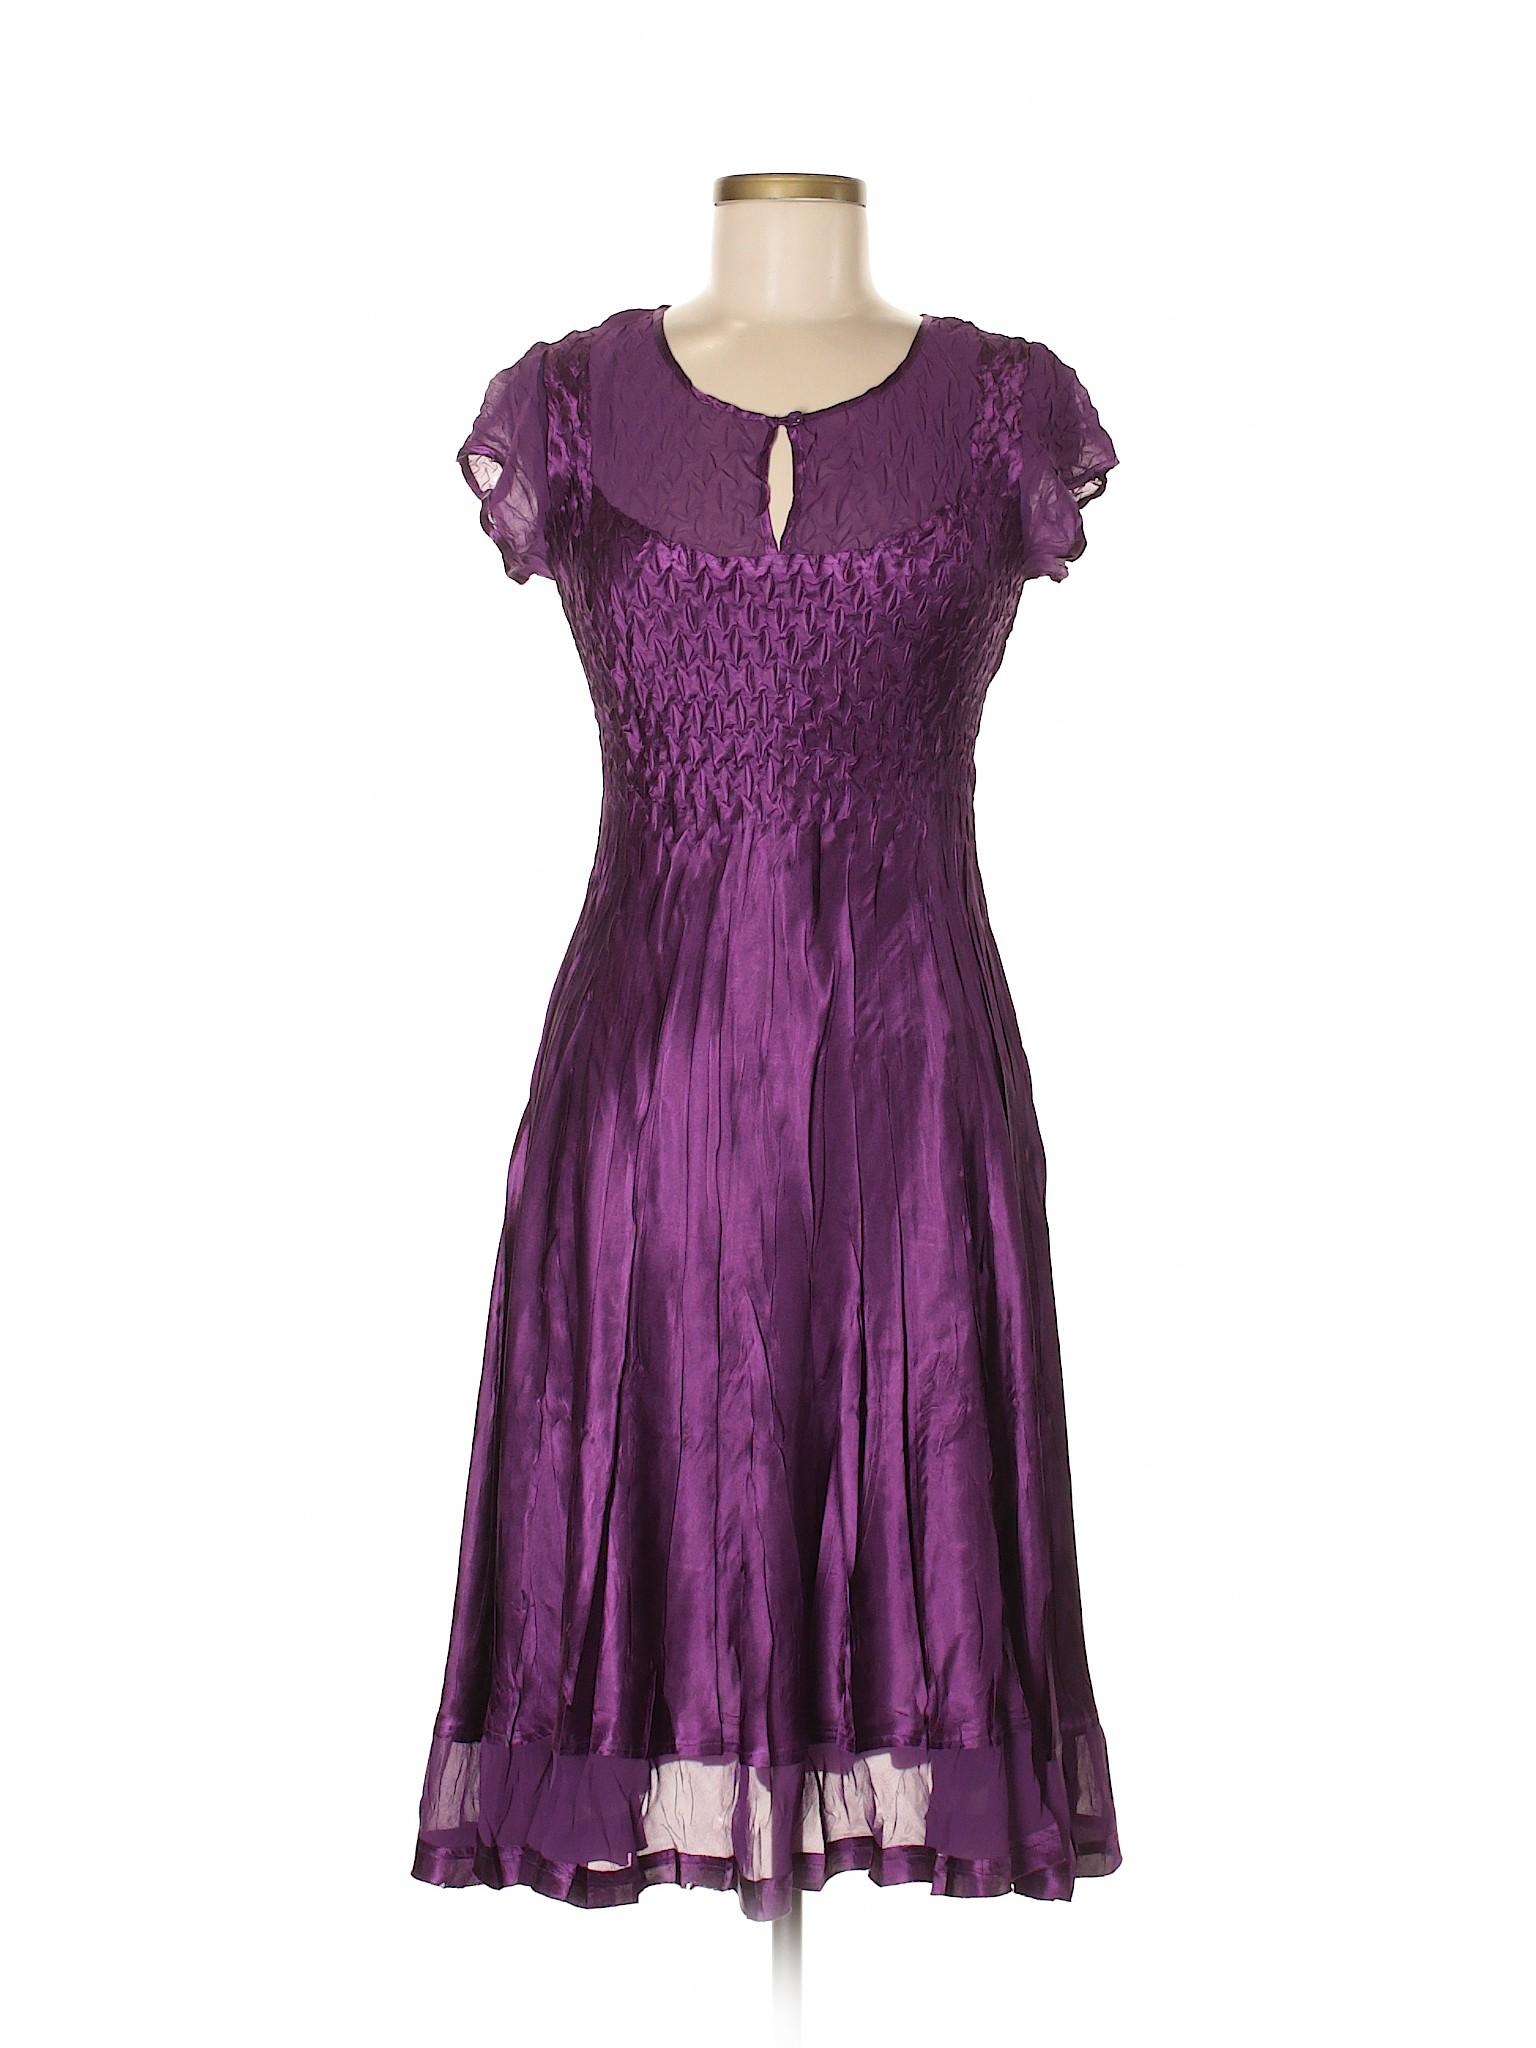 S winter Dress Casual L Boutique Fashions Taqgxw